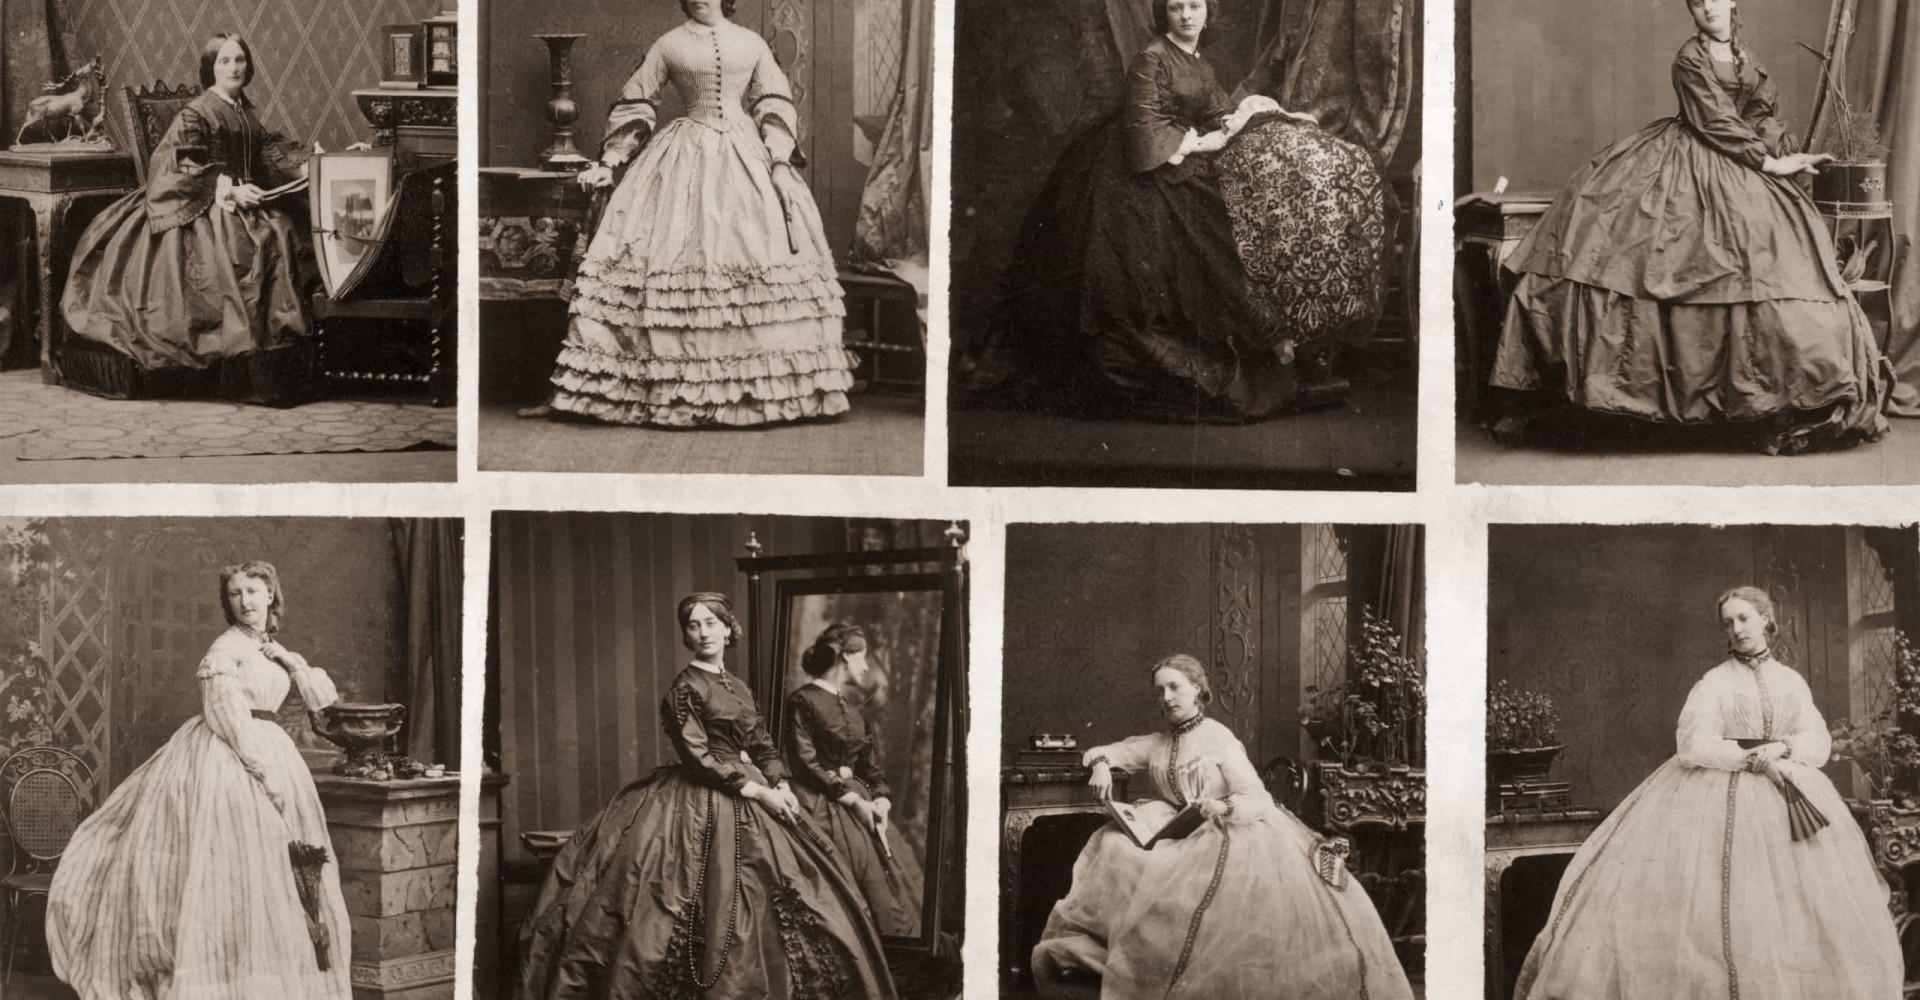 Incredible photos from the Victorian era